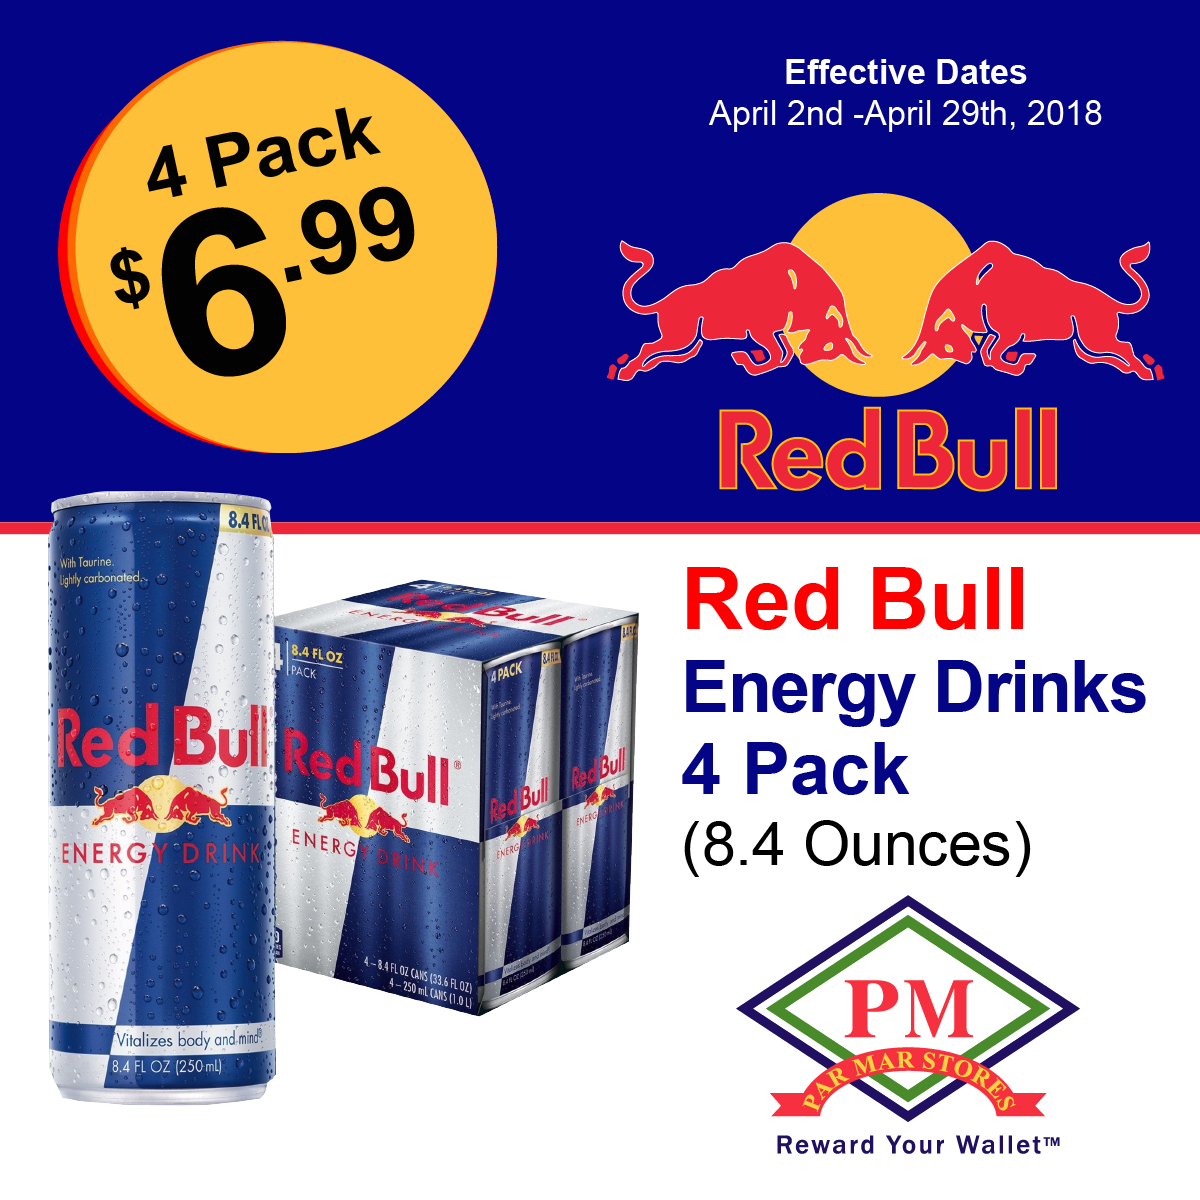 Red Bull Promo-2